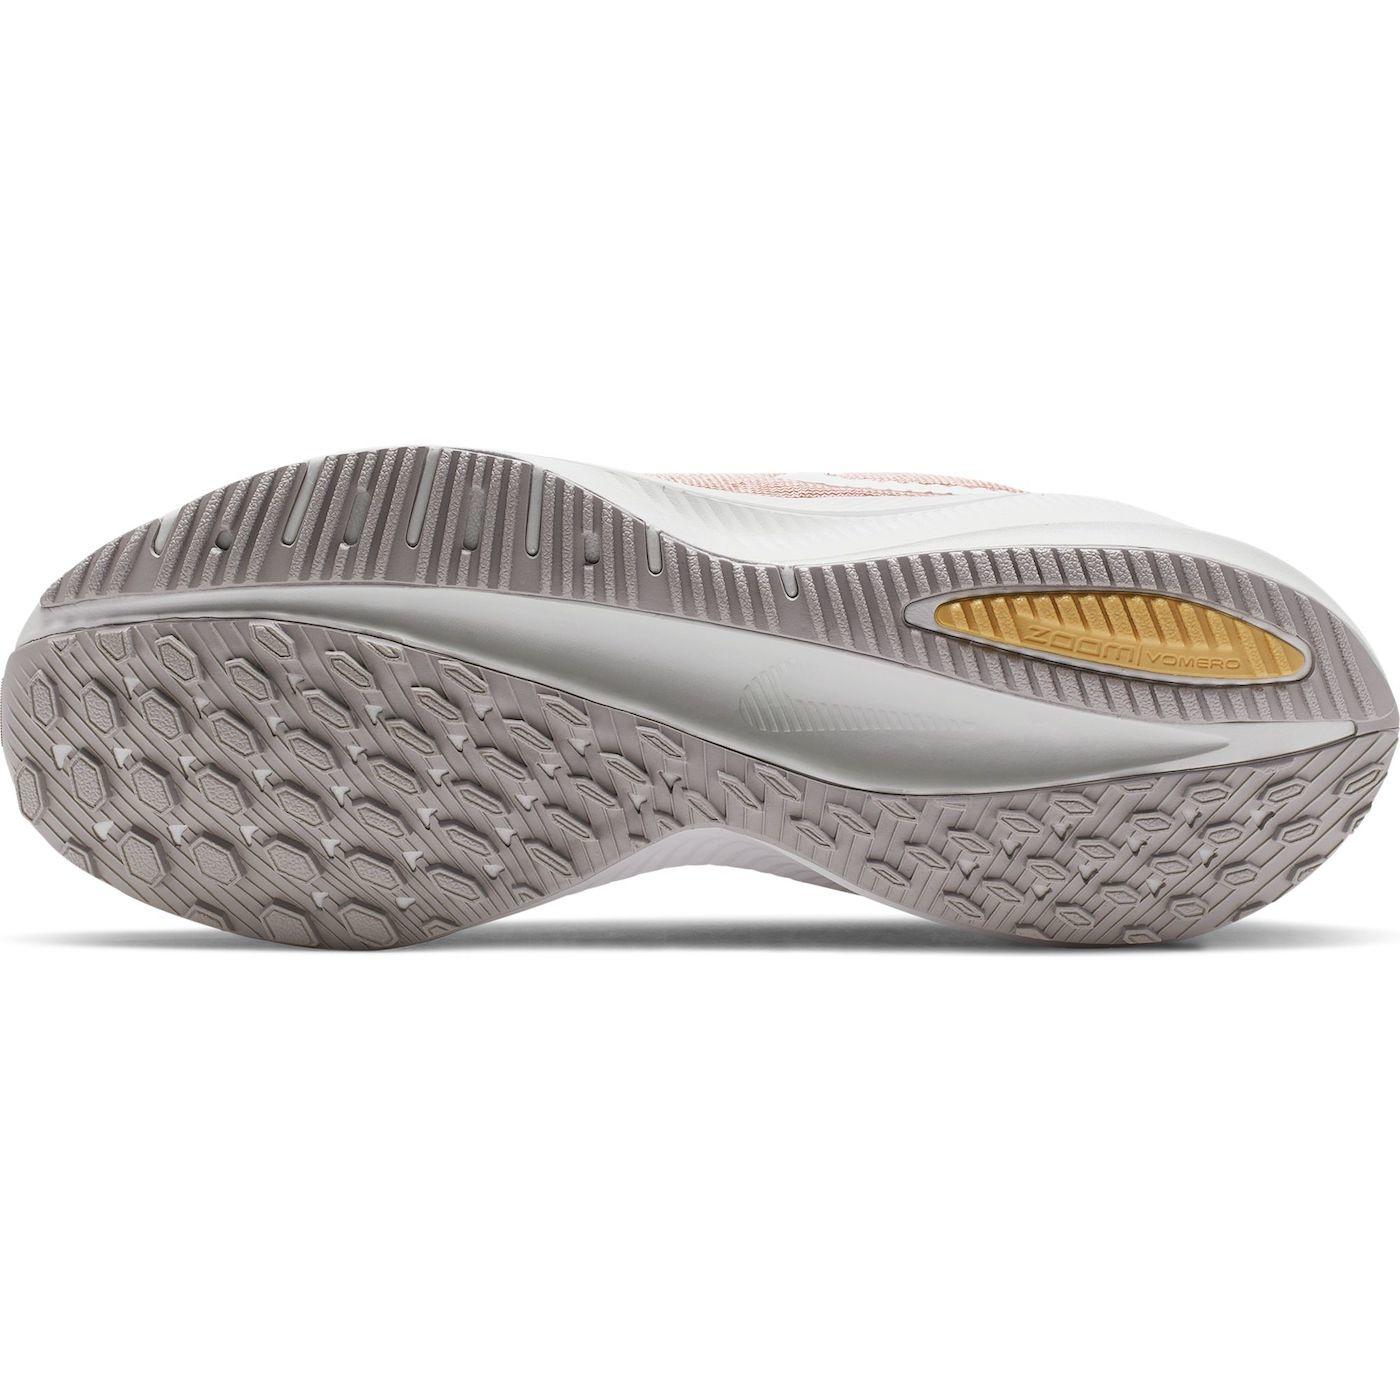 Nike AIR ZOOM VOMERO 14 WMNS COMFORTABELE NEUTRALE HARDLOOPSCHOEN